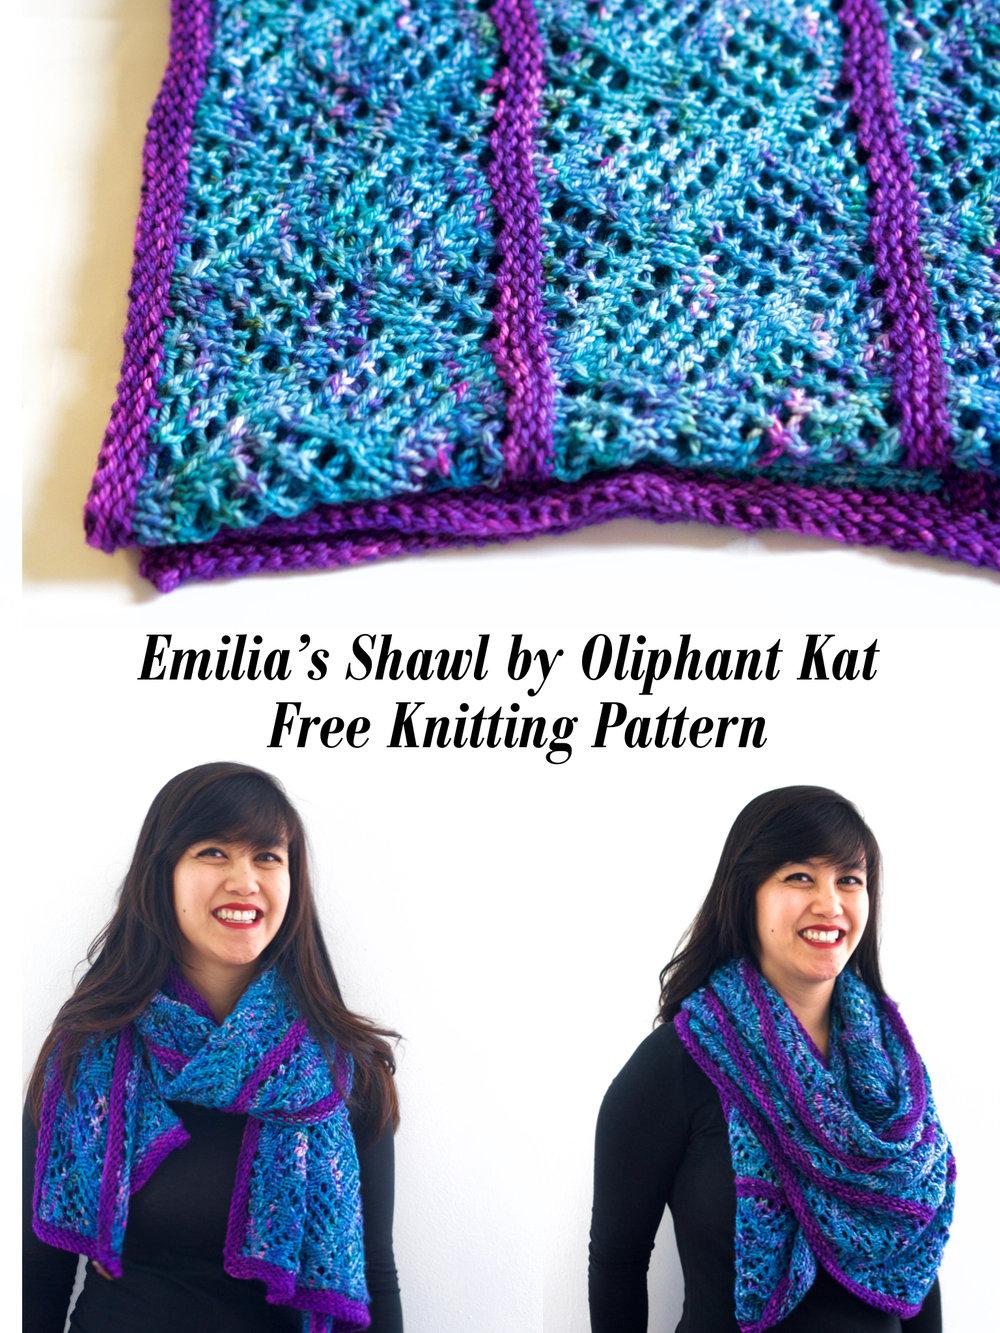 Emilia_Shawl_Free_Knitting_Pattern_4.jpg